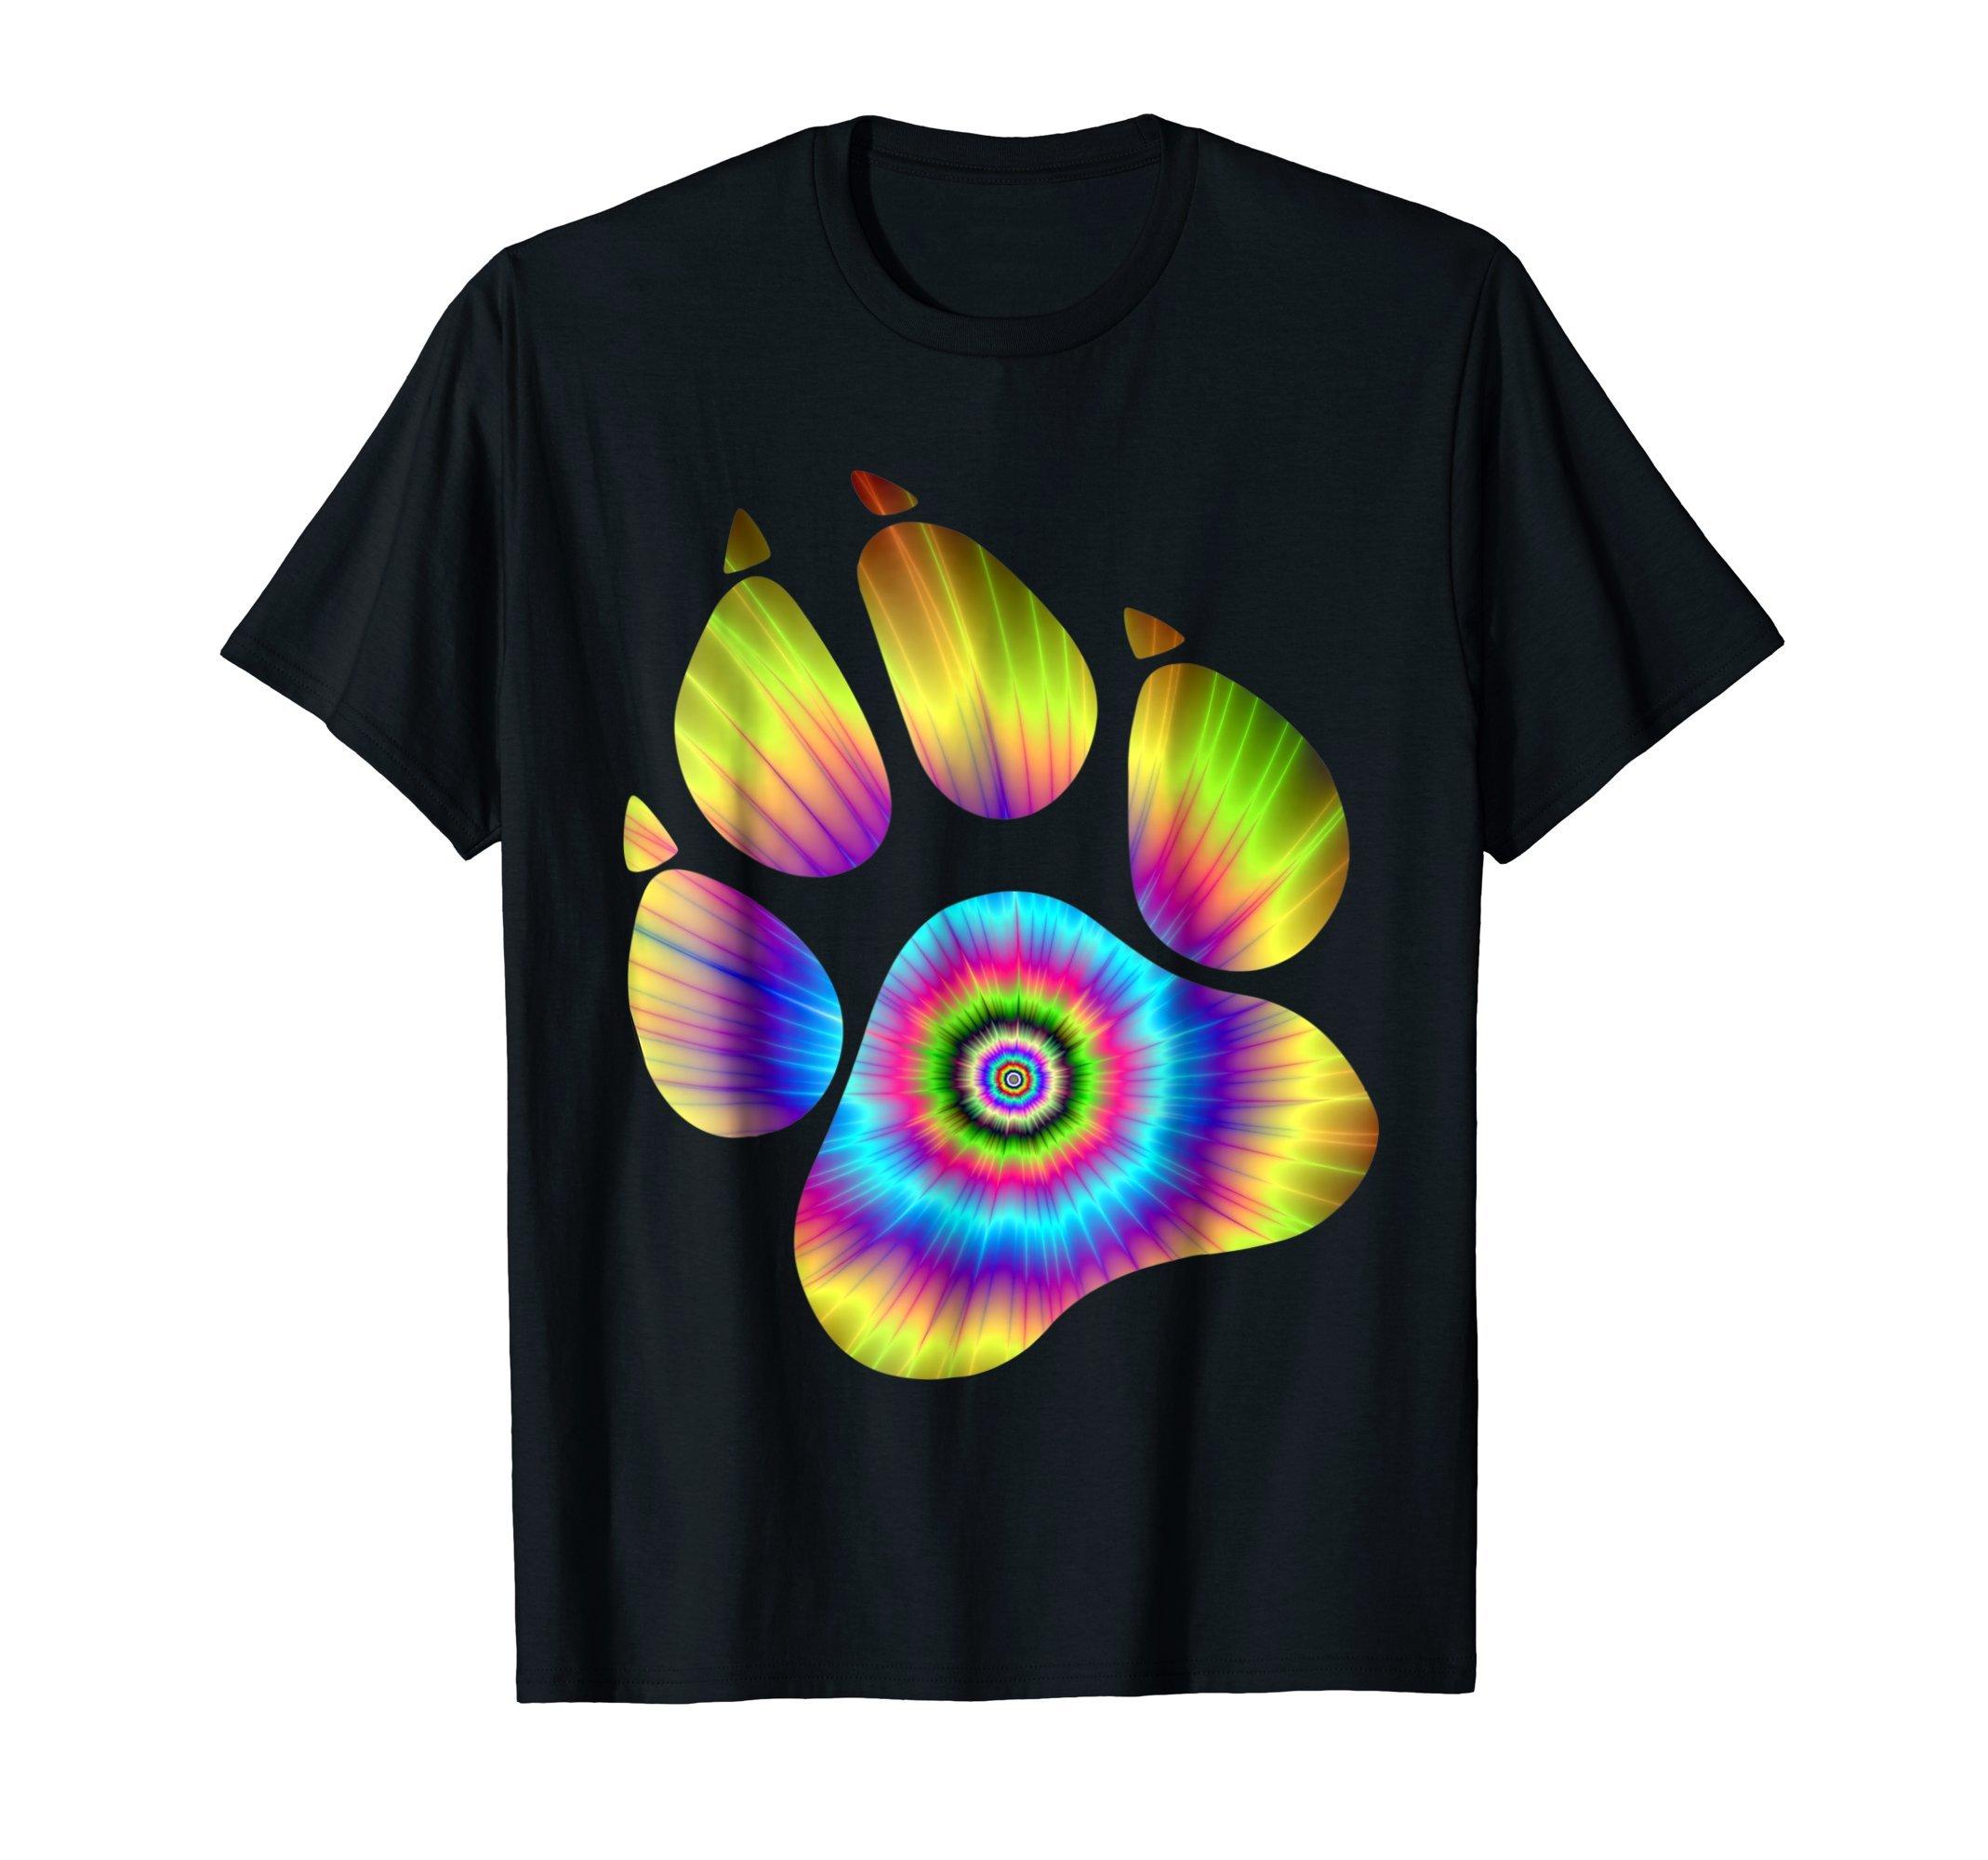 Tie Dye Animal Shirt Cat Dog Paw Print Shirt For Pet Lover